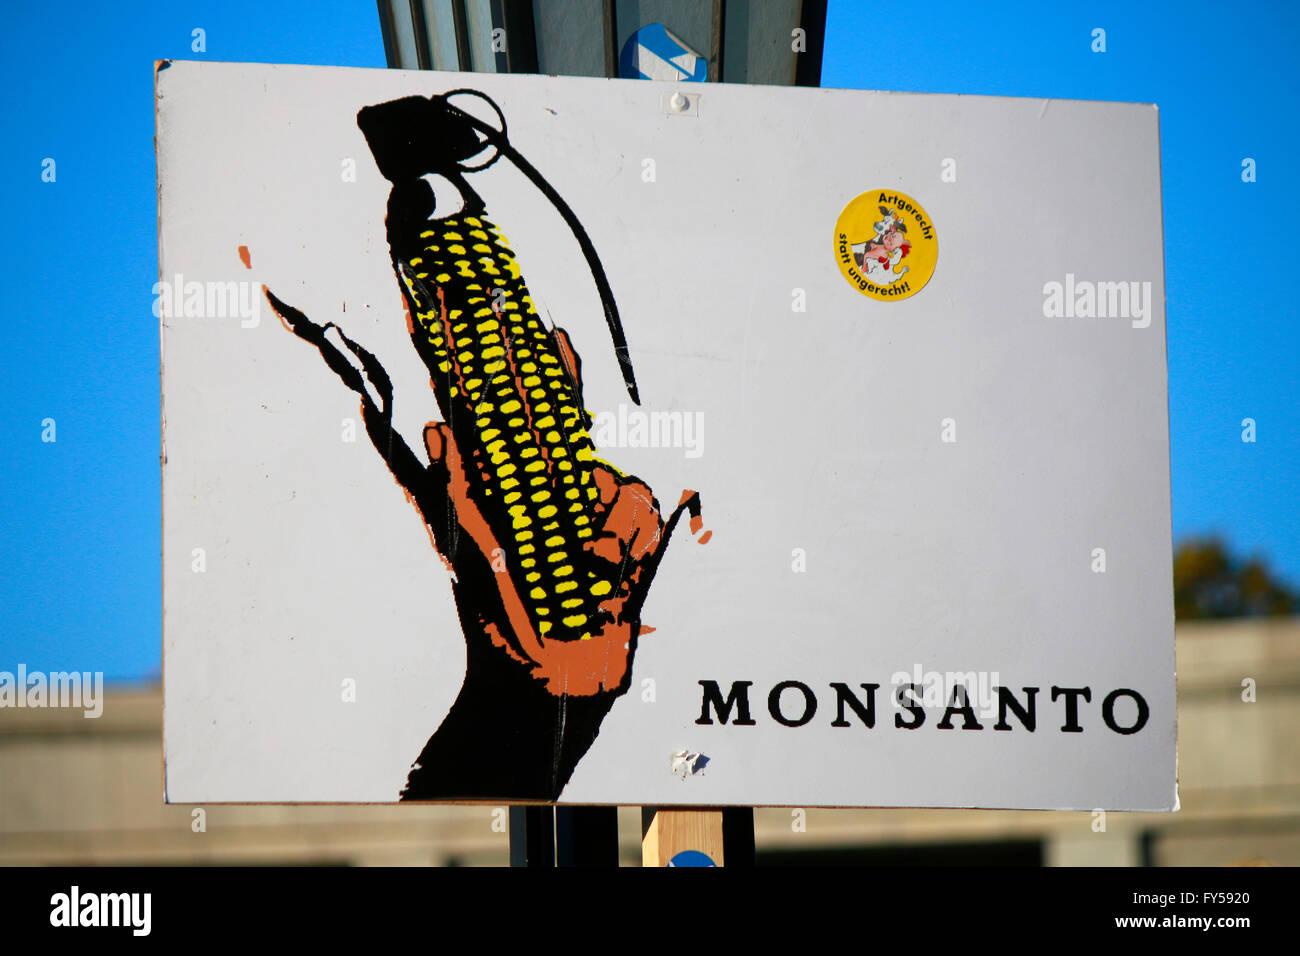 Protest gegen den Konzern 'Monsanto' - Impressionen Demonstrationen gegen TTIP, 10. Oktober 2015, Berlin. - Stock Image